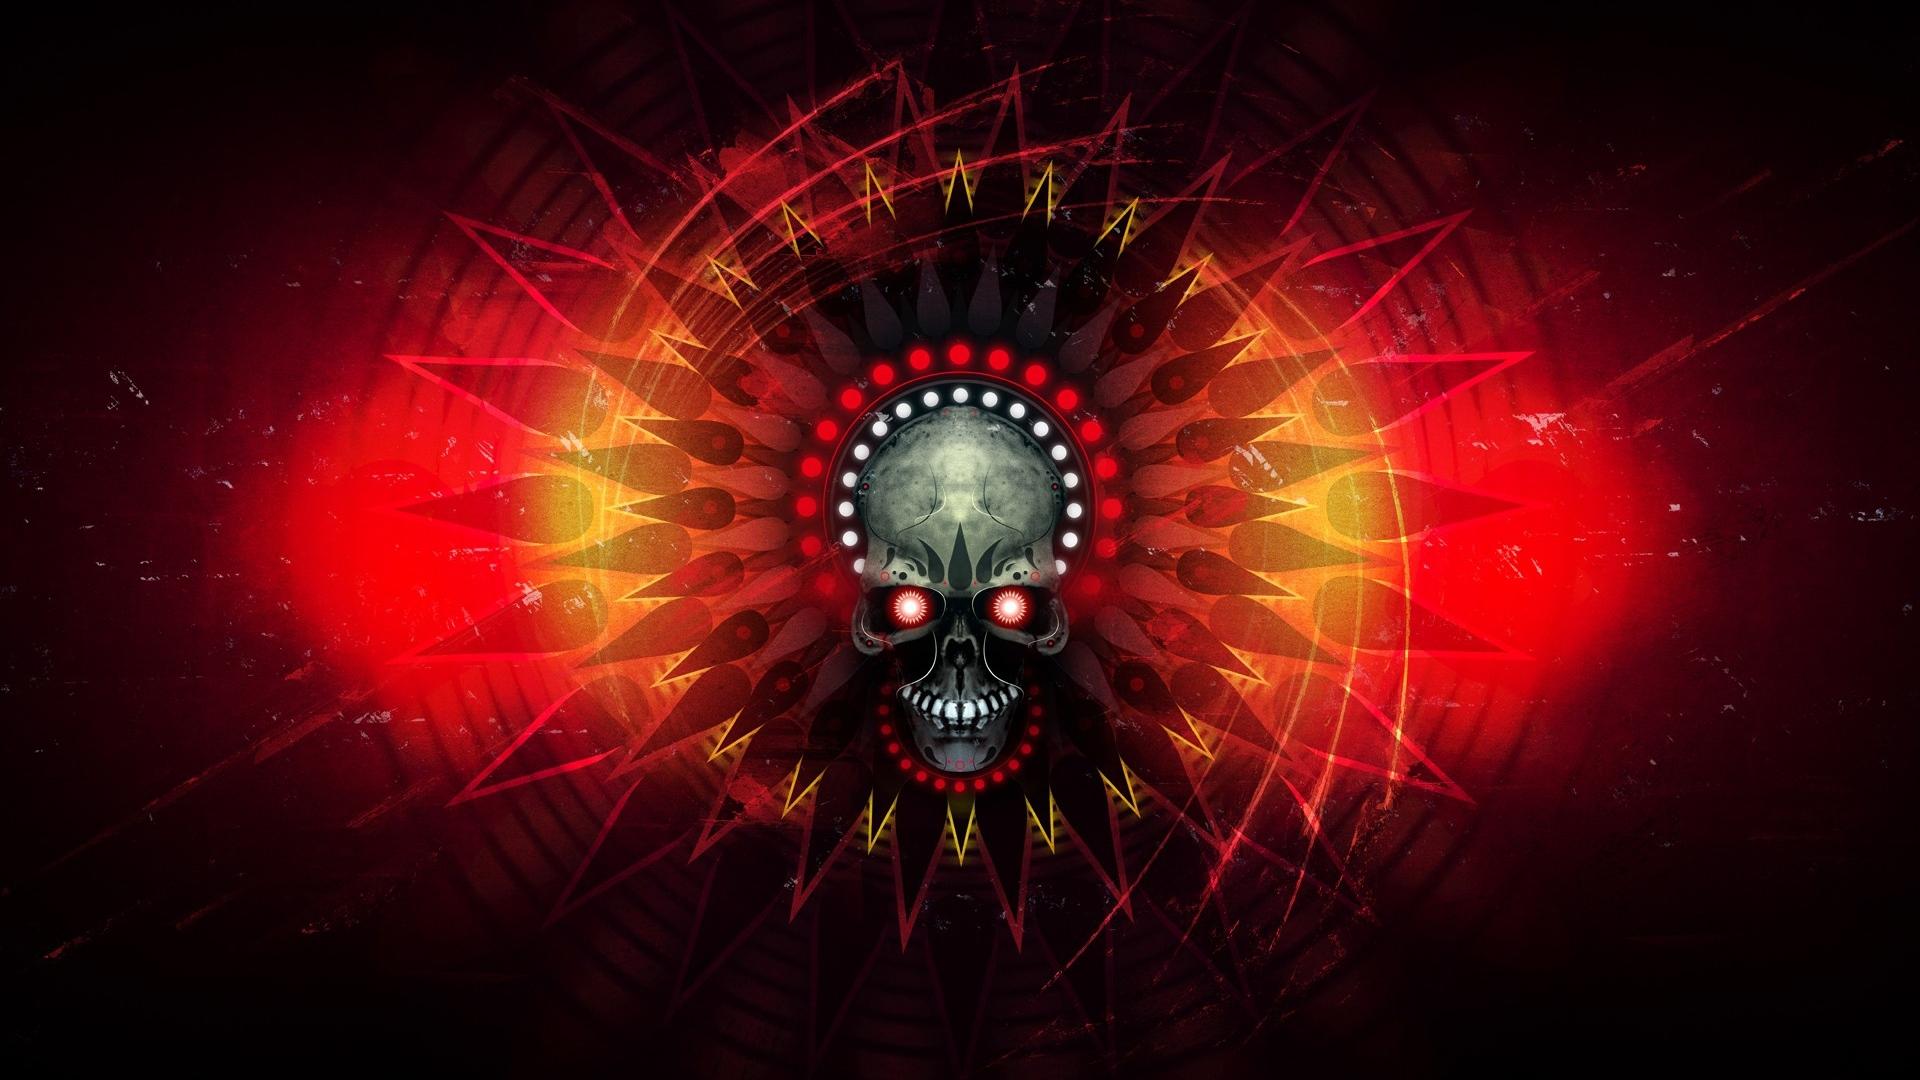 Download wallpaper 1920x1080 skull fire lines shadow full hd skull fire lines voltagebd Choice Image